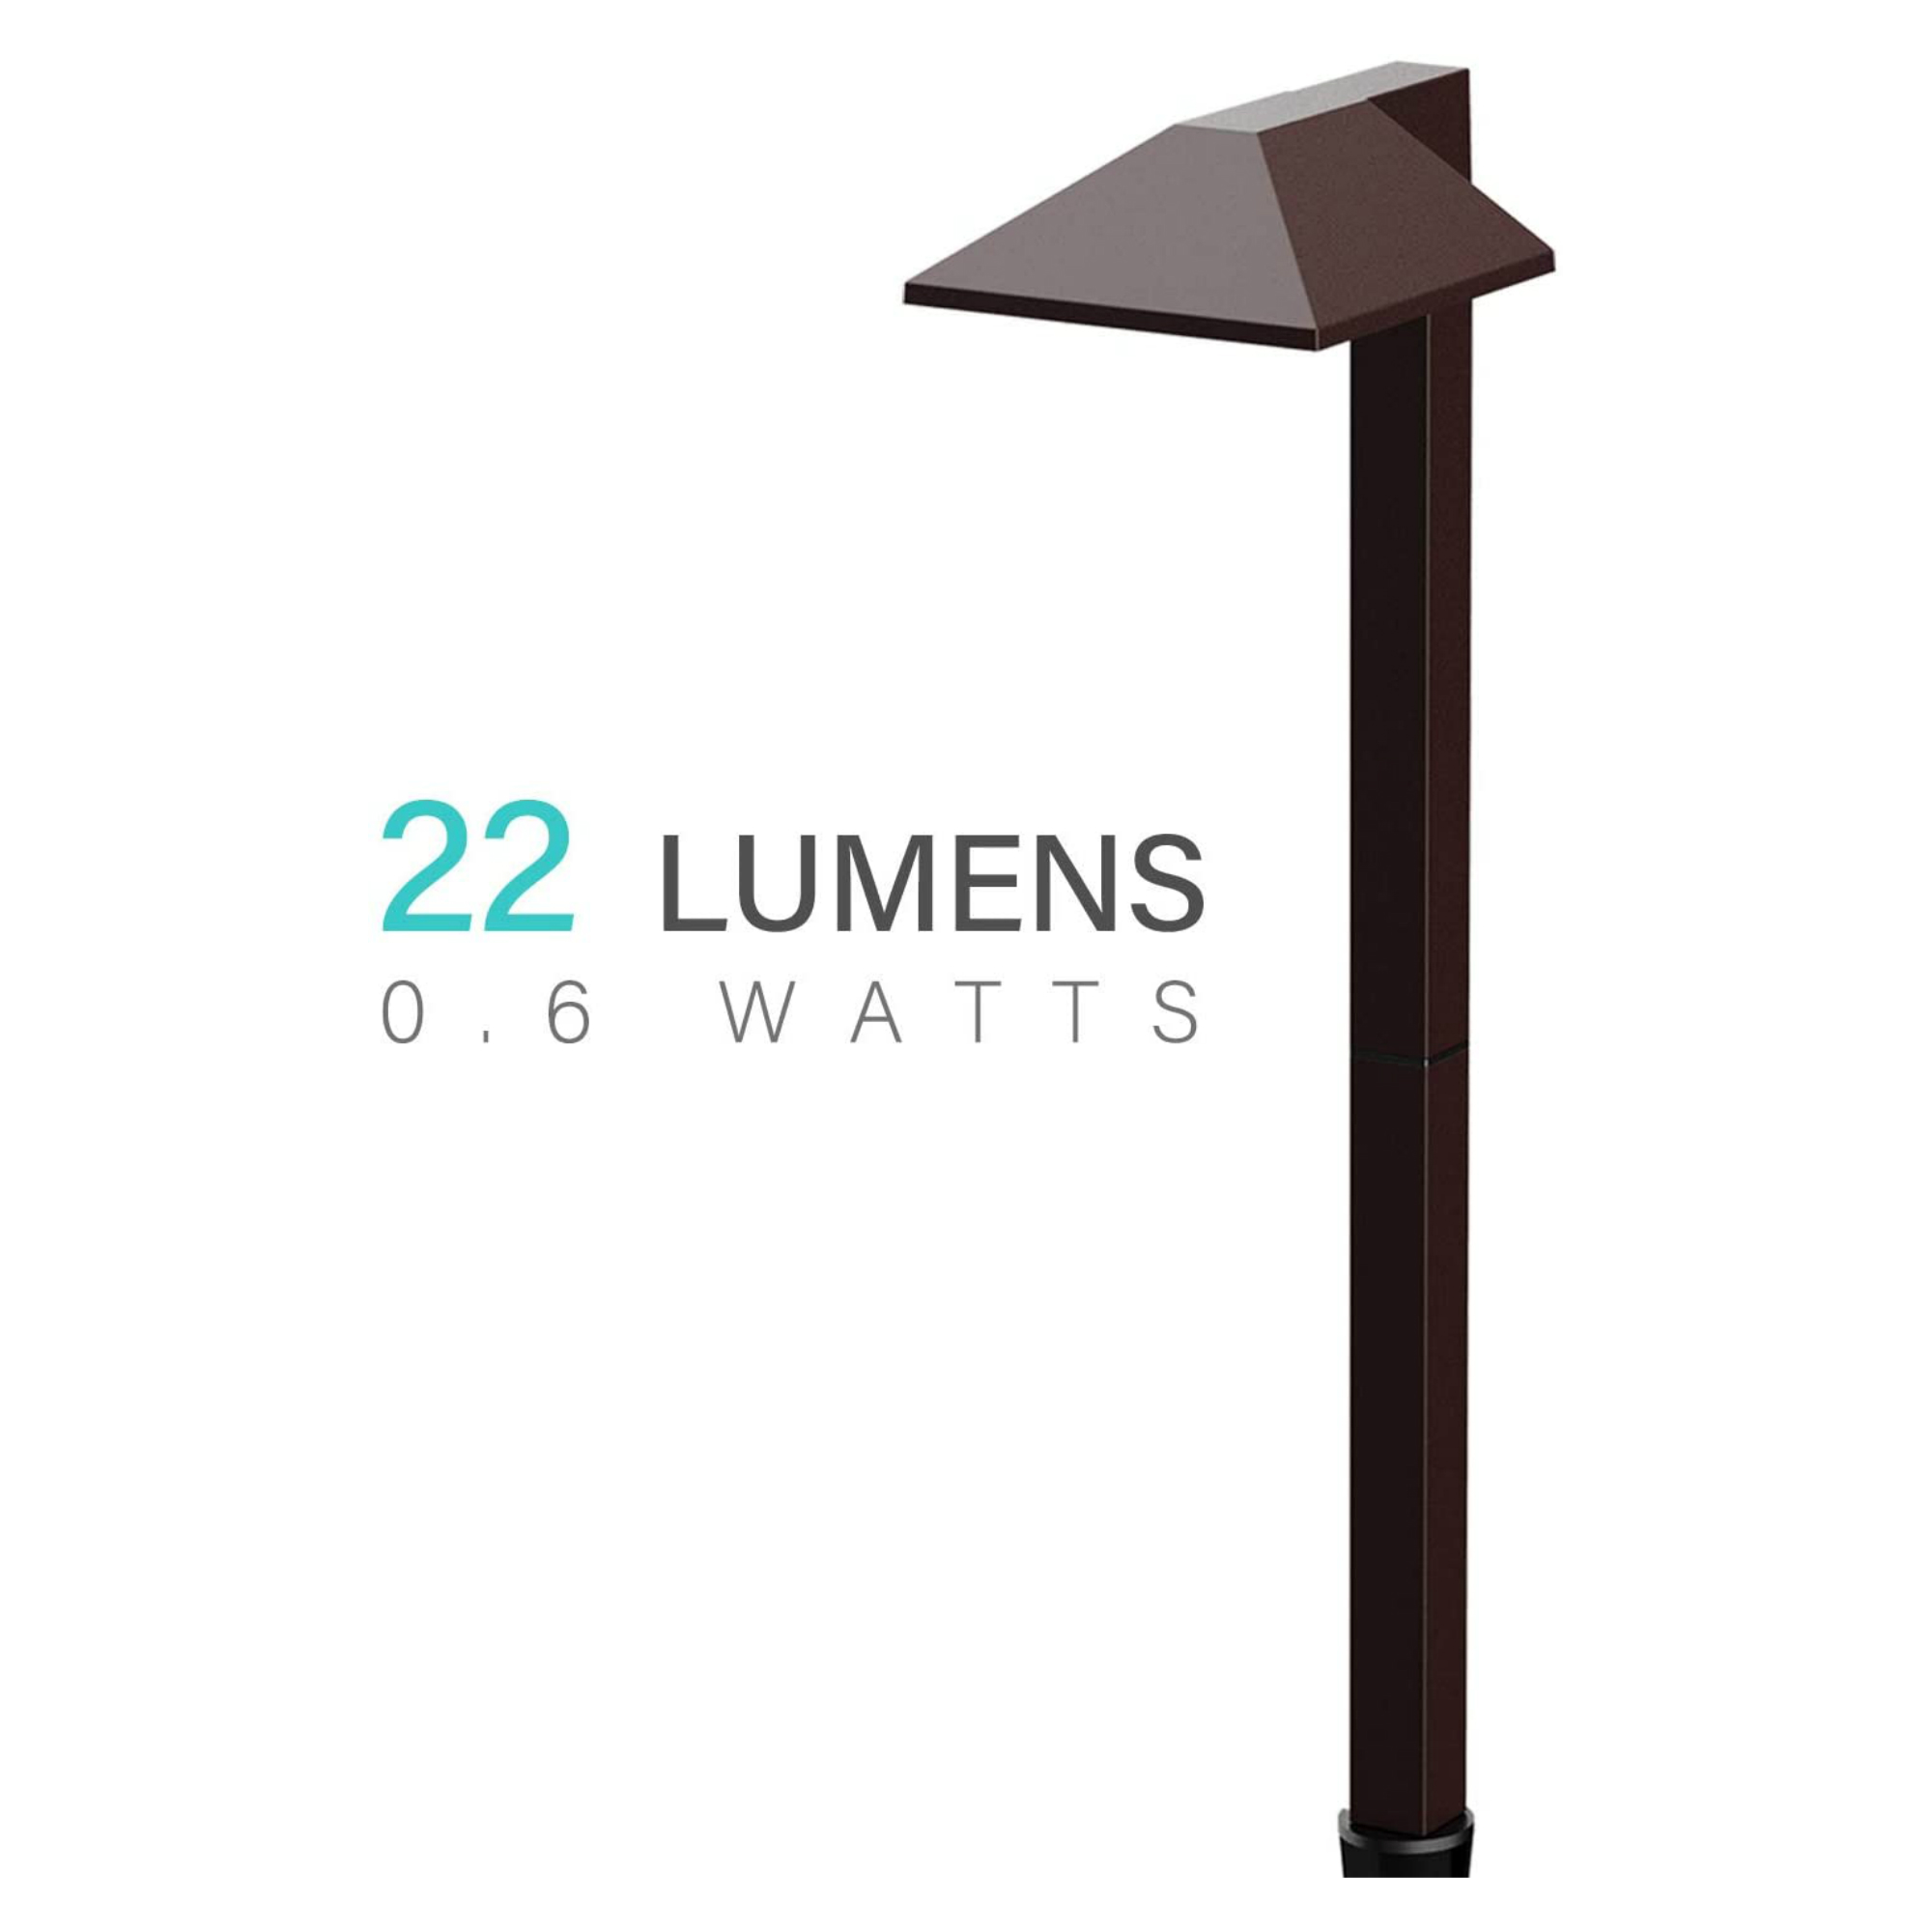 malibu c 0 6 watt led landscape lighting low voltage for garden pathway lawn charcoal brown walmart com